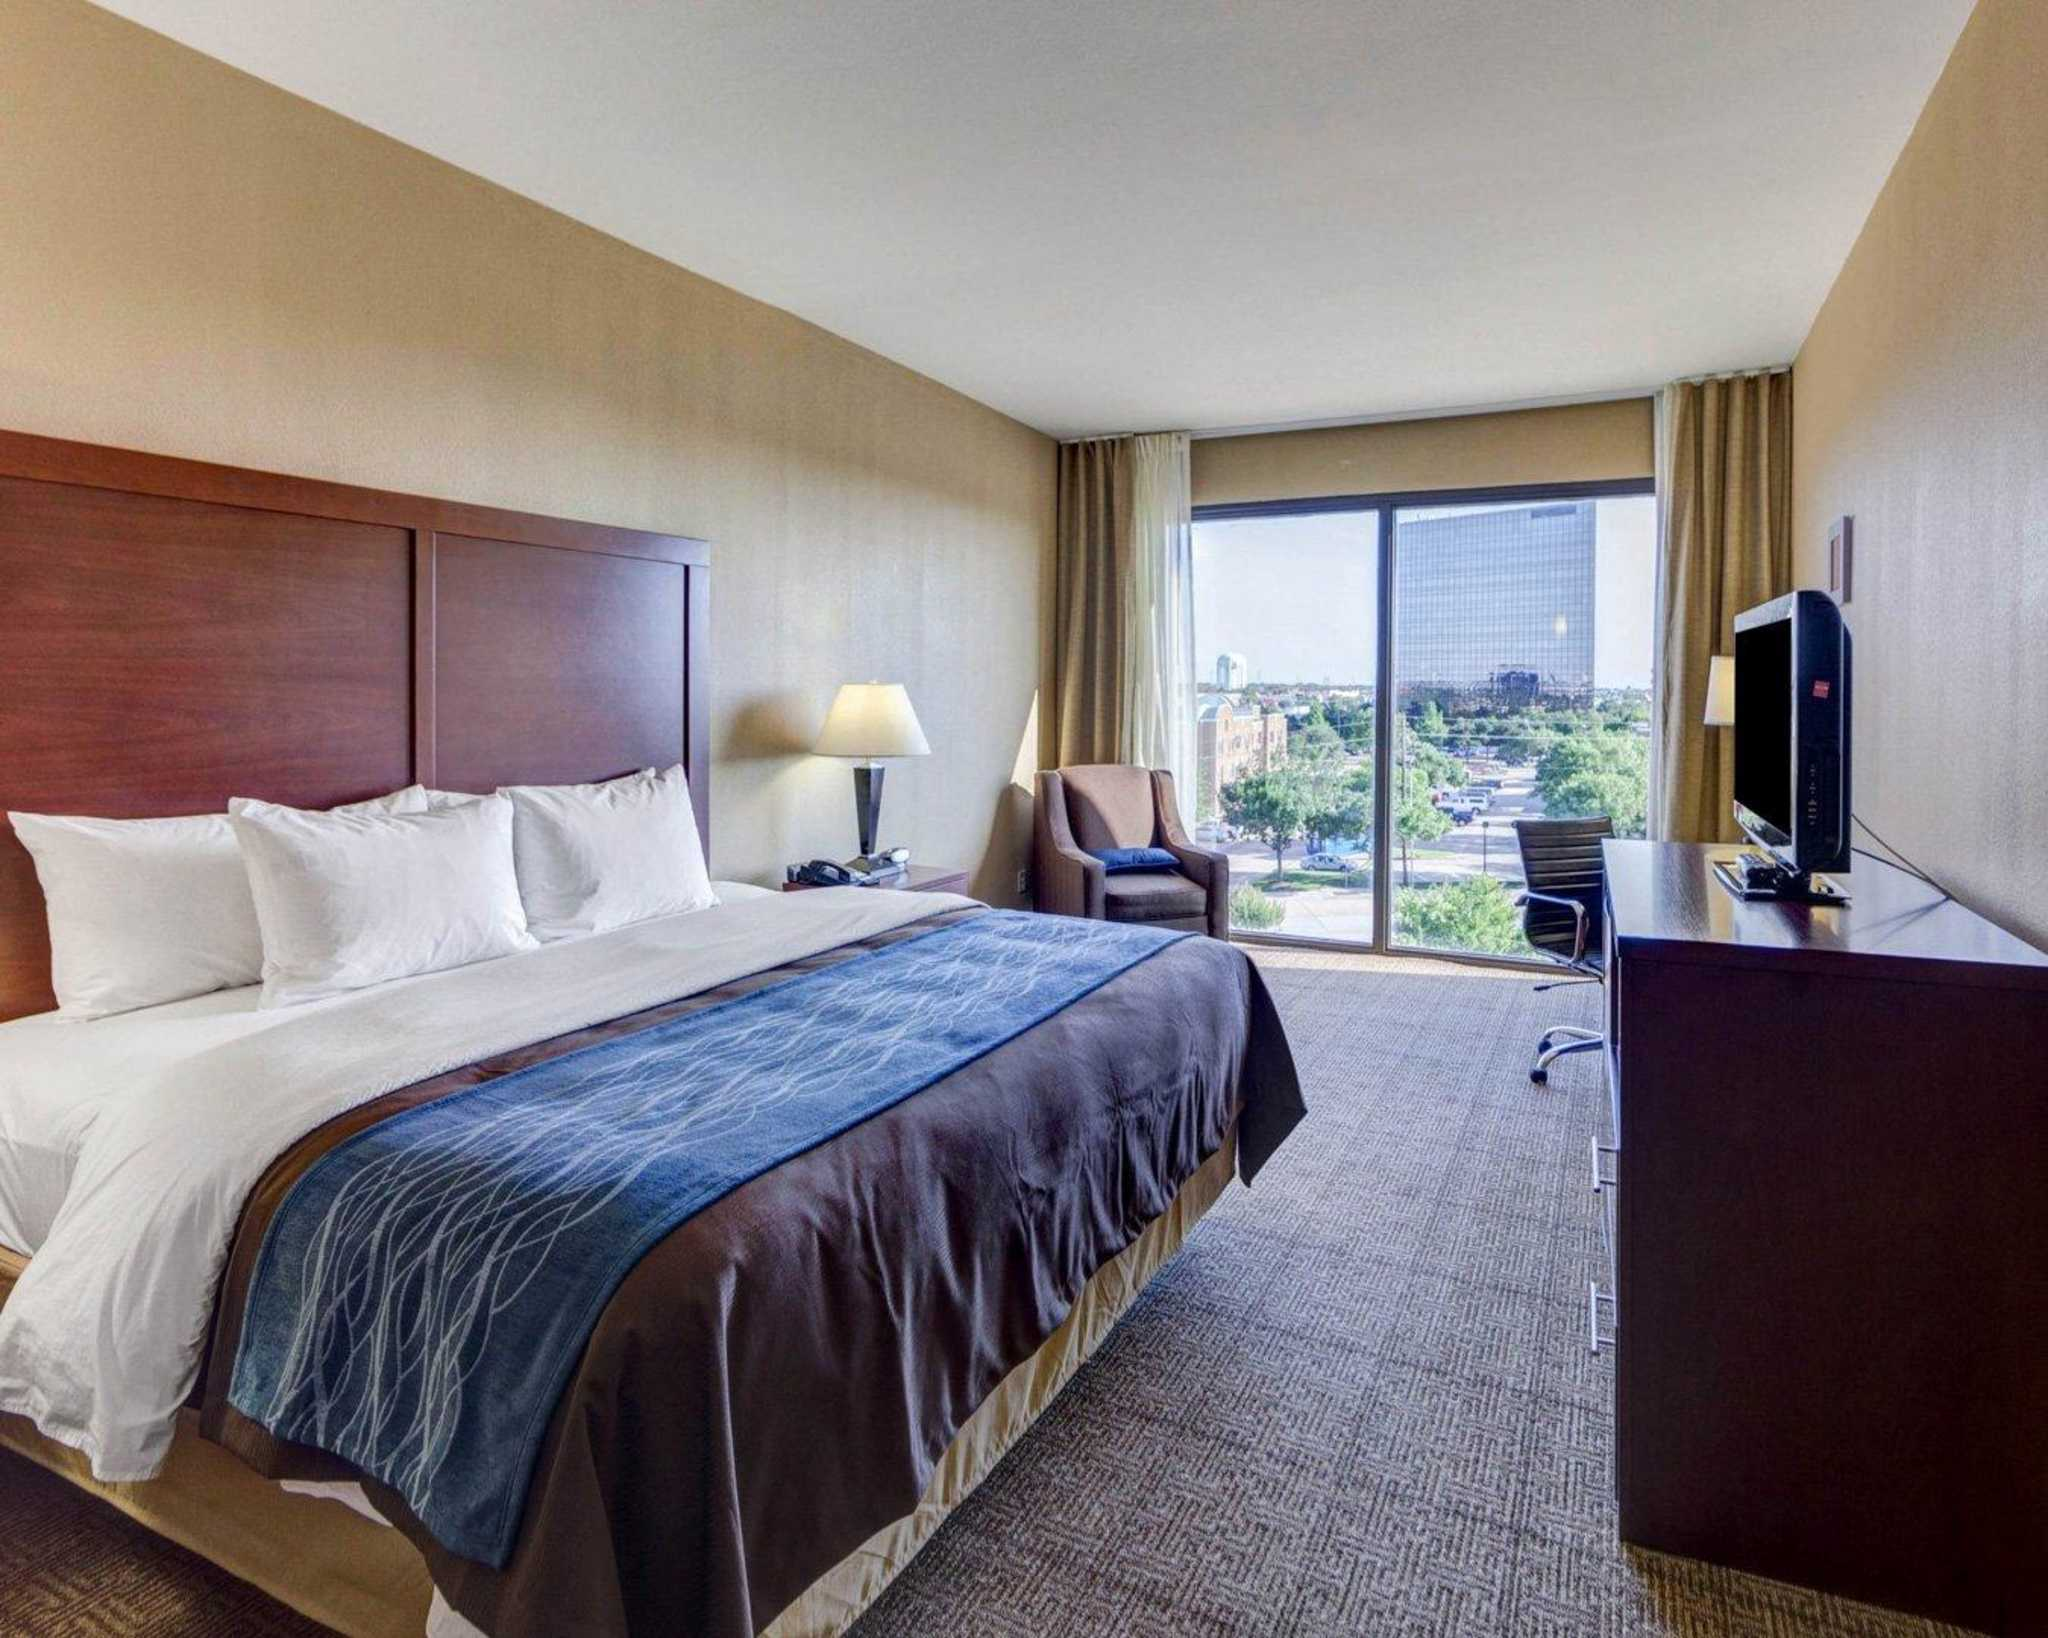 Comfort Inn & Suites Plano East image 6